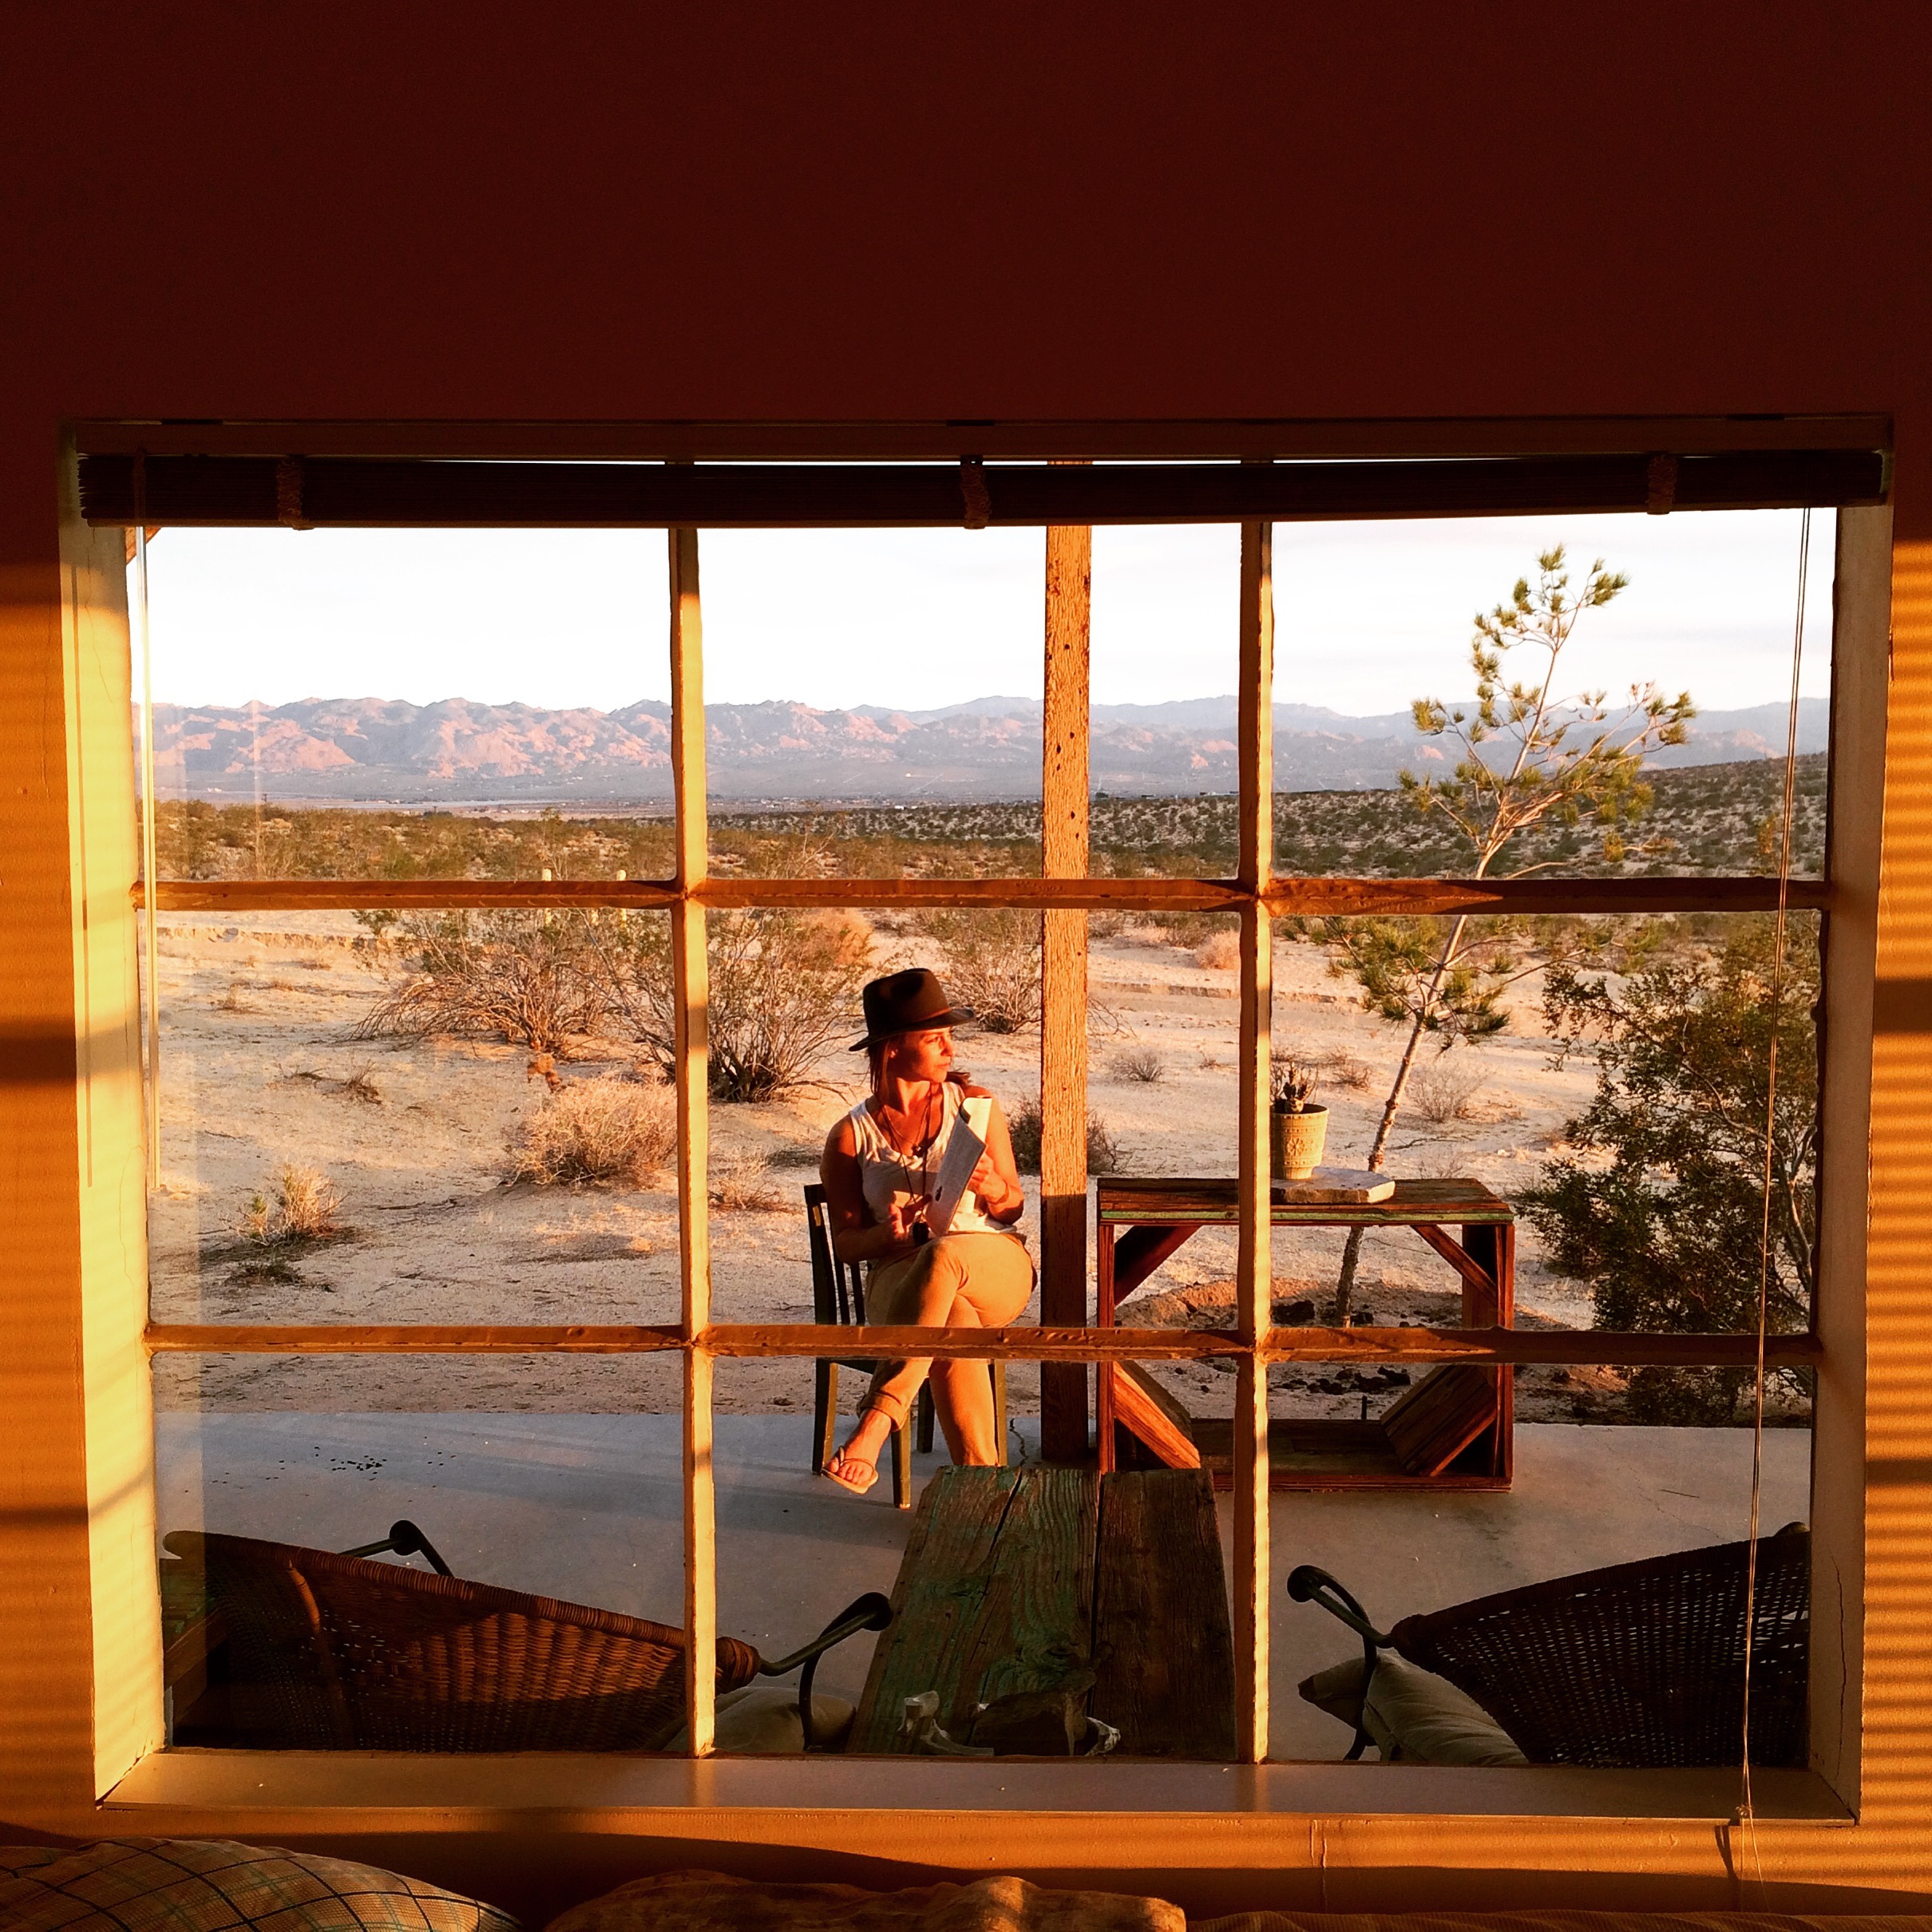 Homesteader Airnbn, Joshua Tree Califnornia - 3 Days*